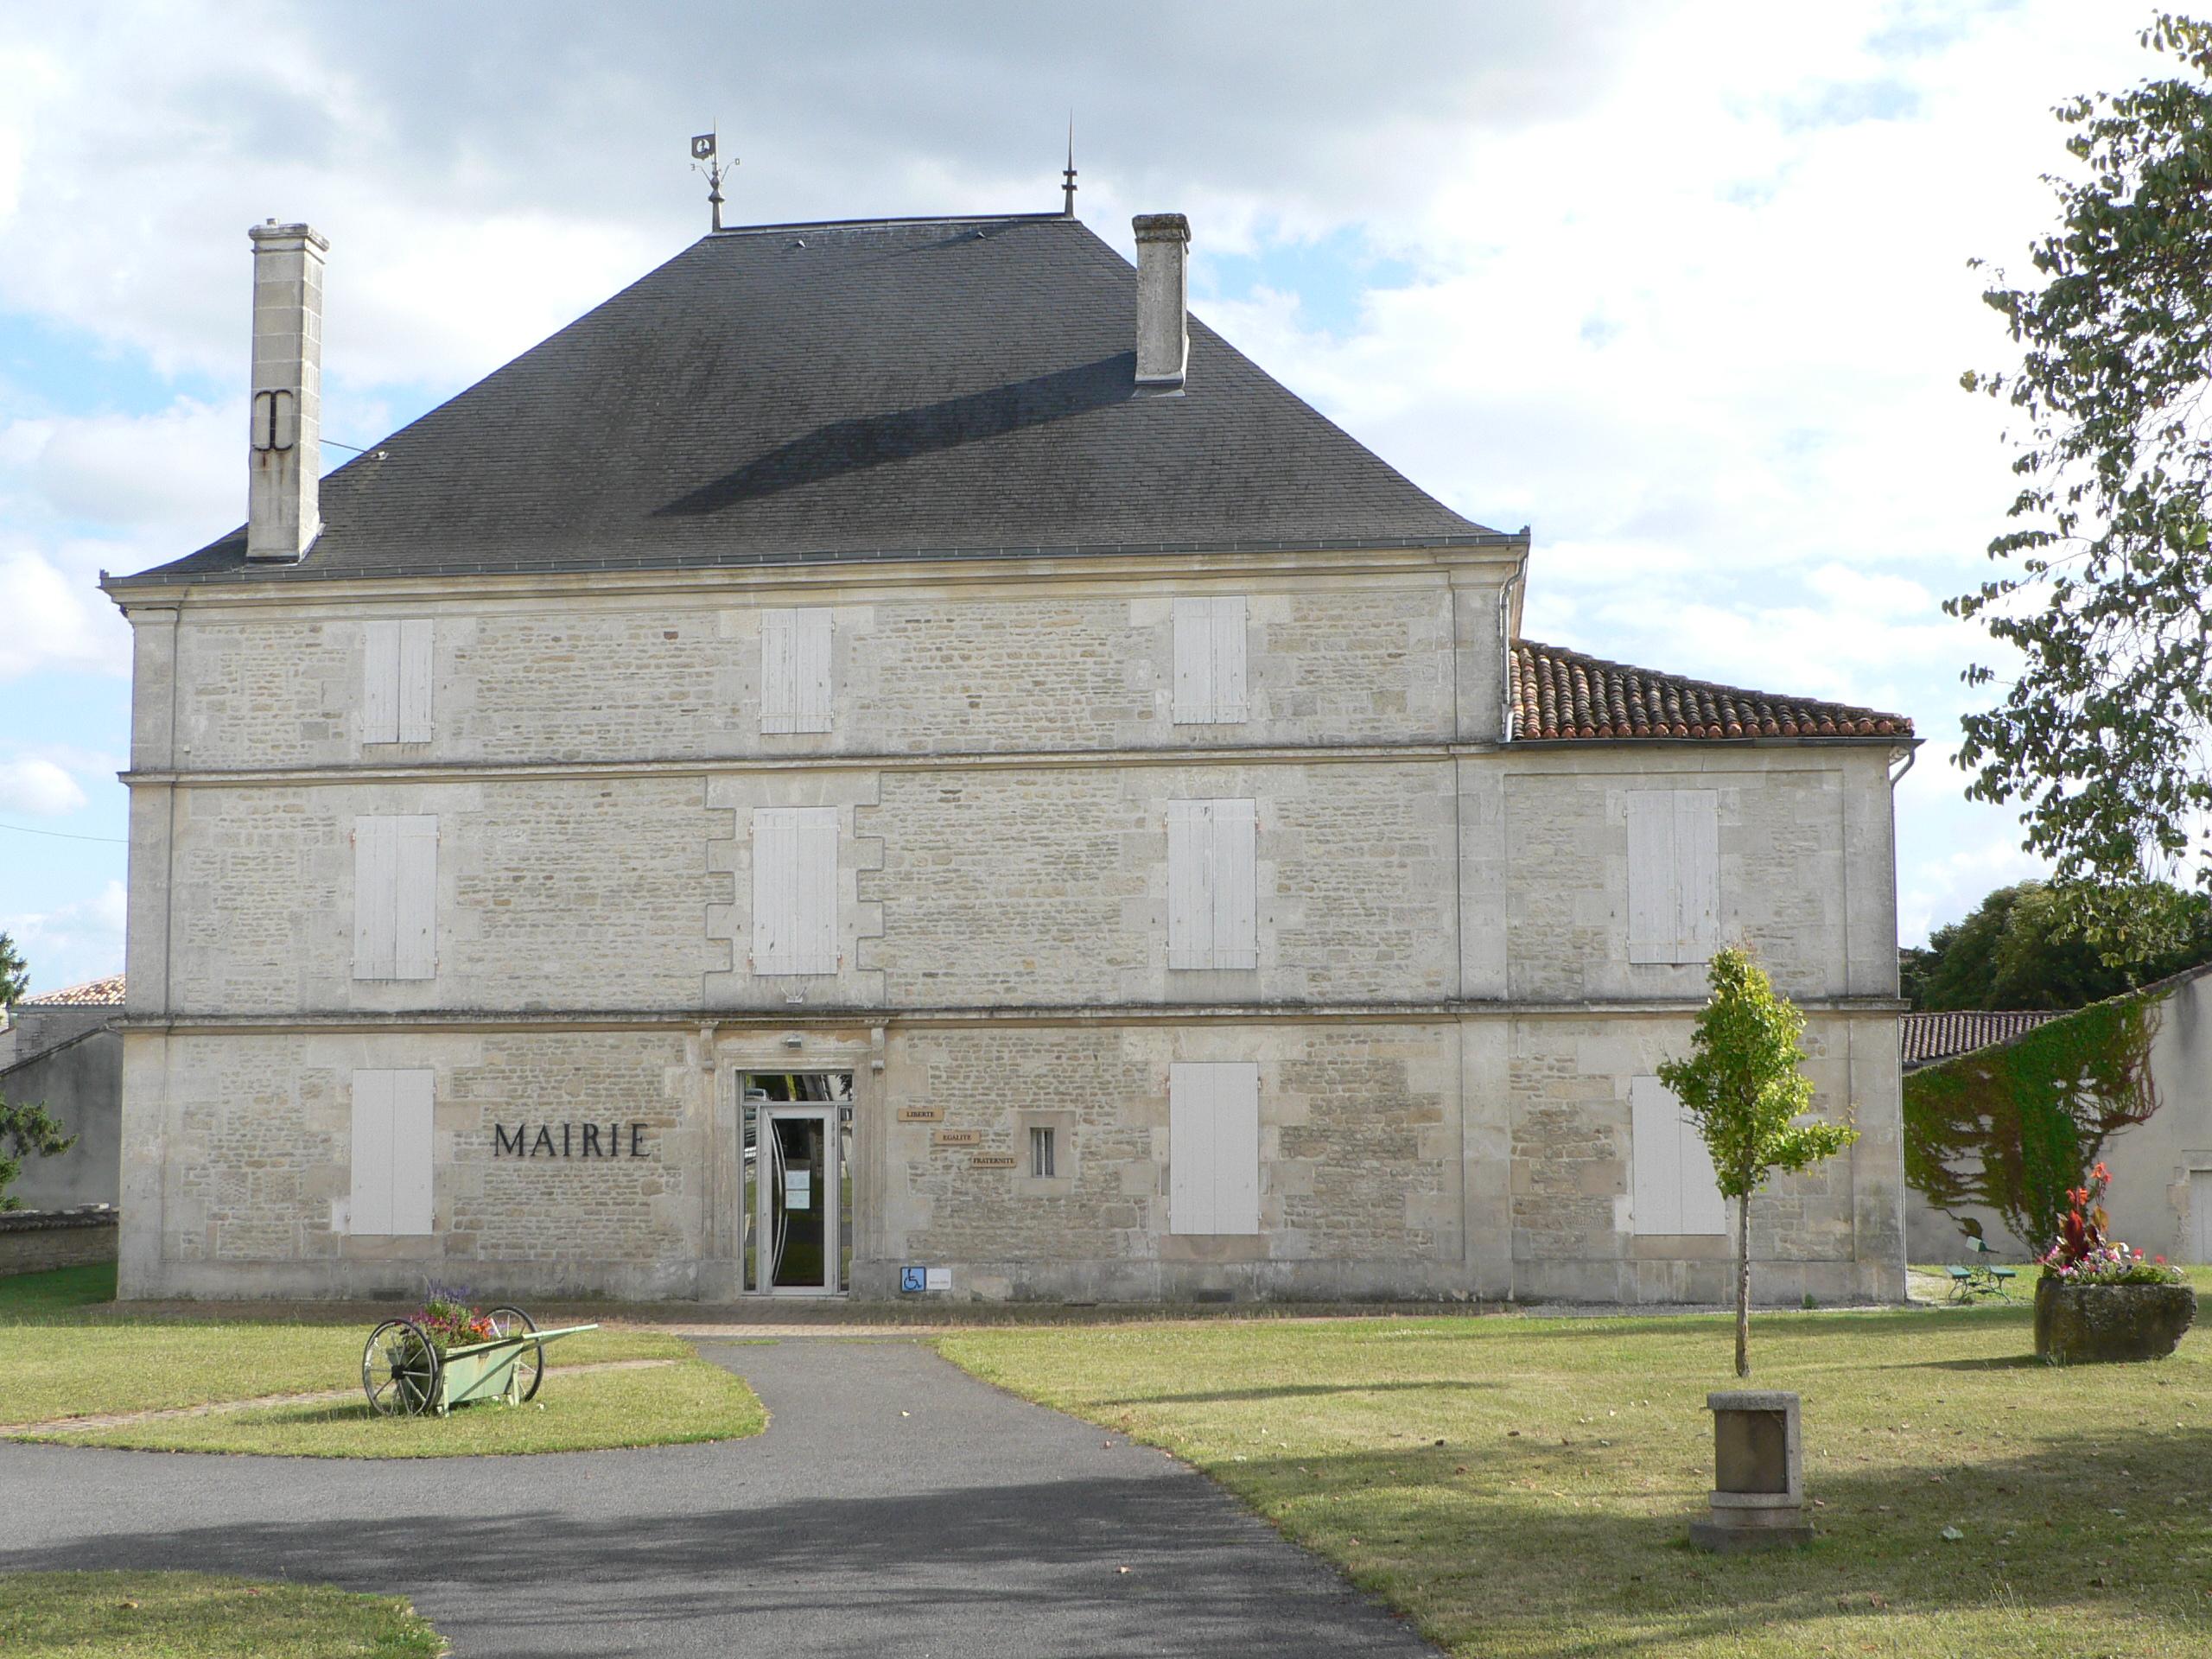 La mairie d'Hiersac